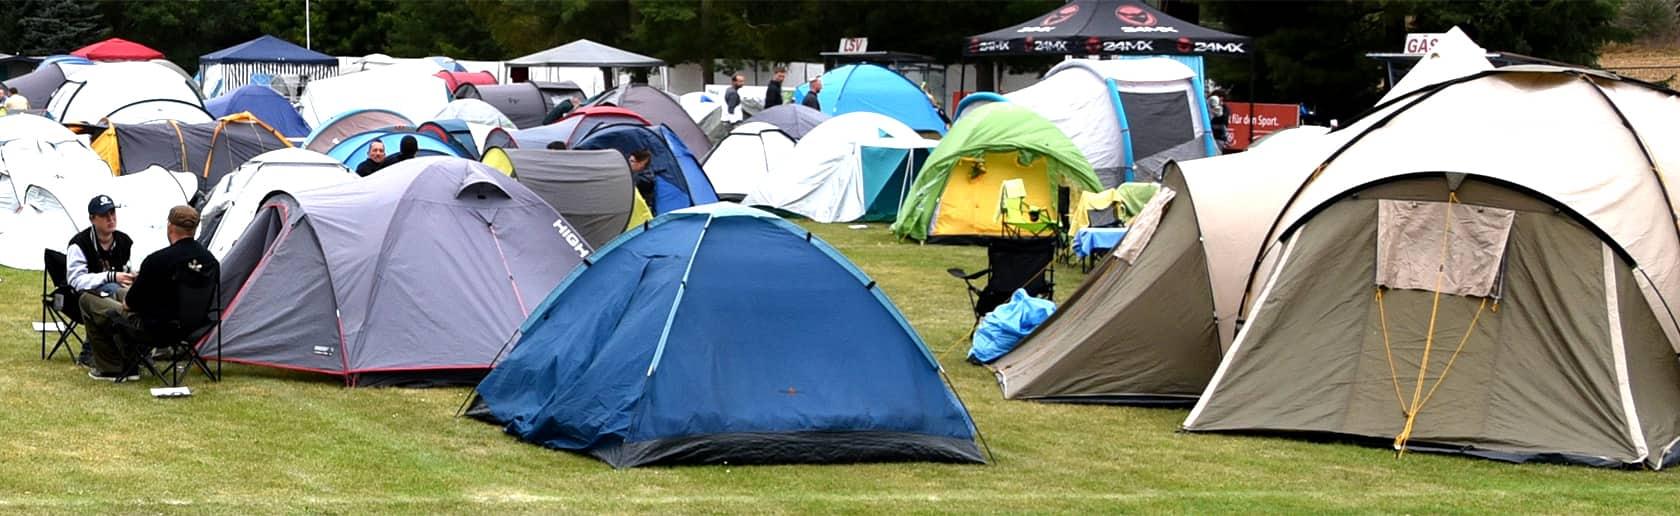 Campen beim Spencerhill Festival